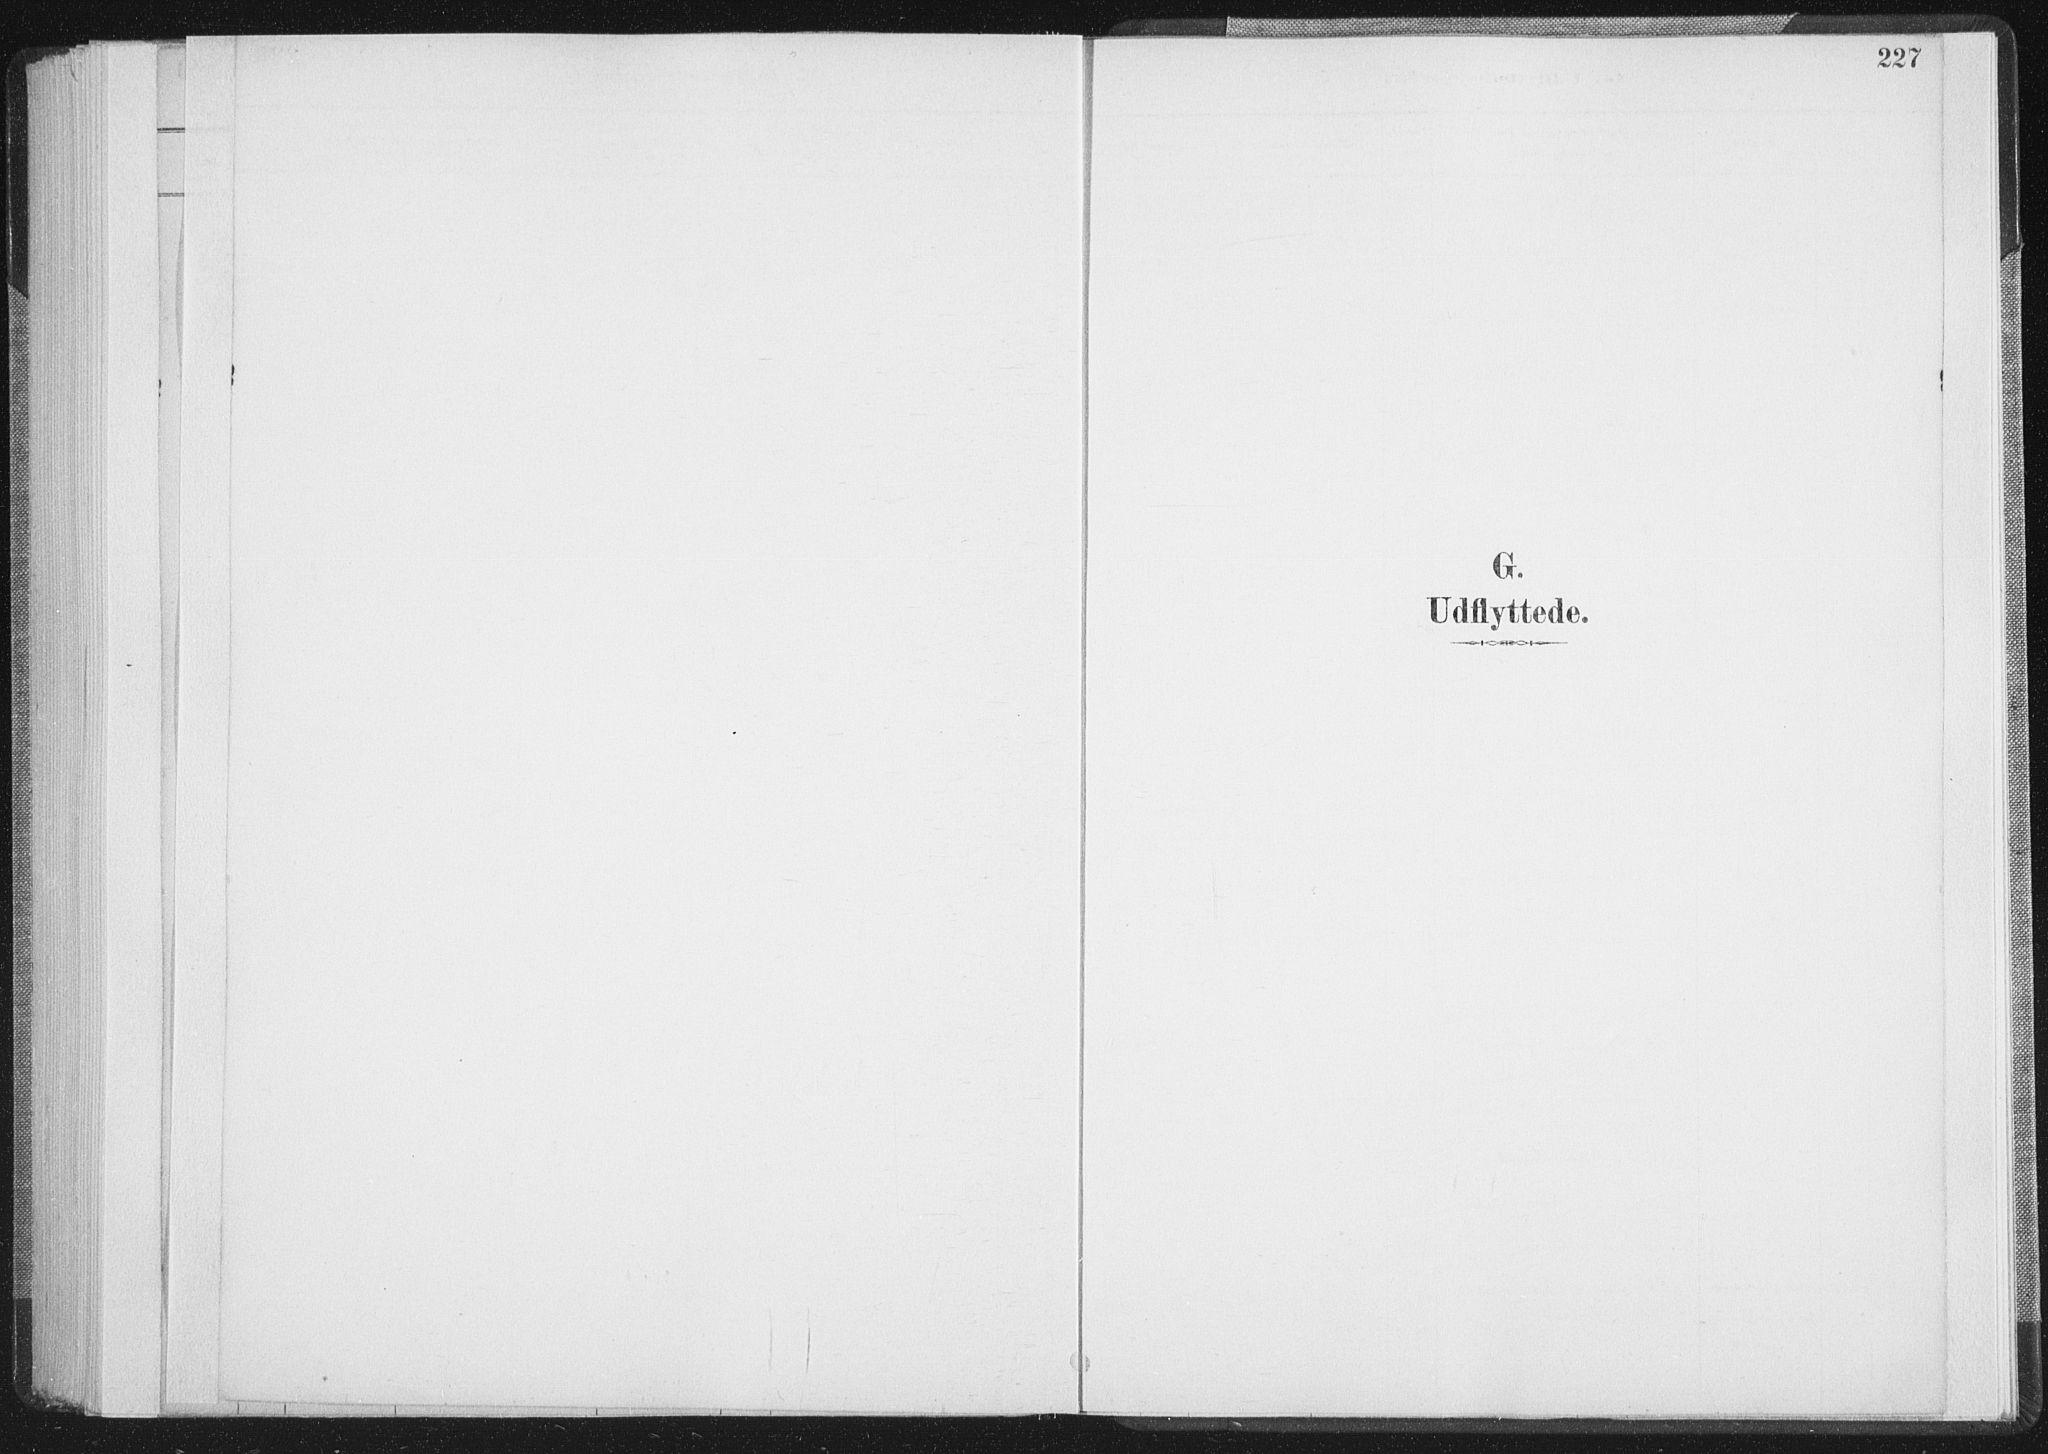 SAT, Ministerialprotokoller, klokkerbøker og fødselsregistre - Nordland, 898/L1422: Ministerialbok nr. 898A02, 1887-1908, s. 227